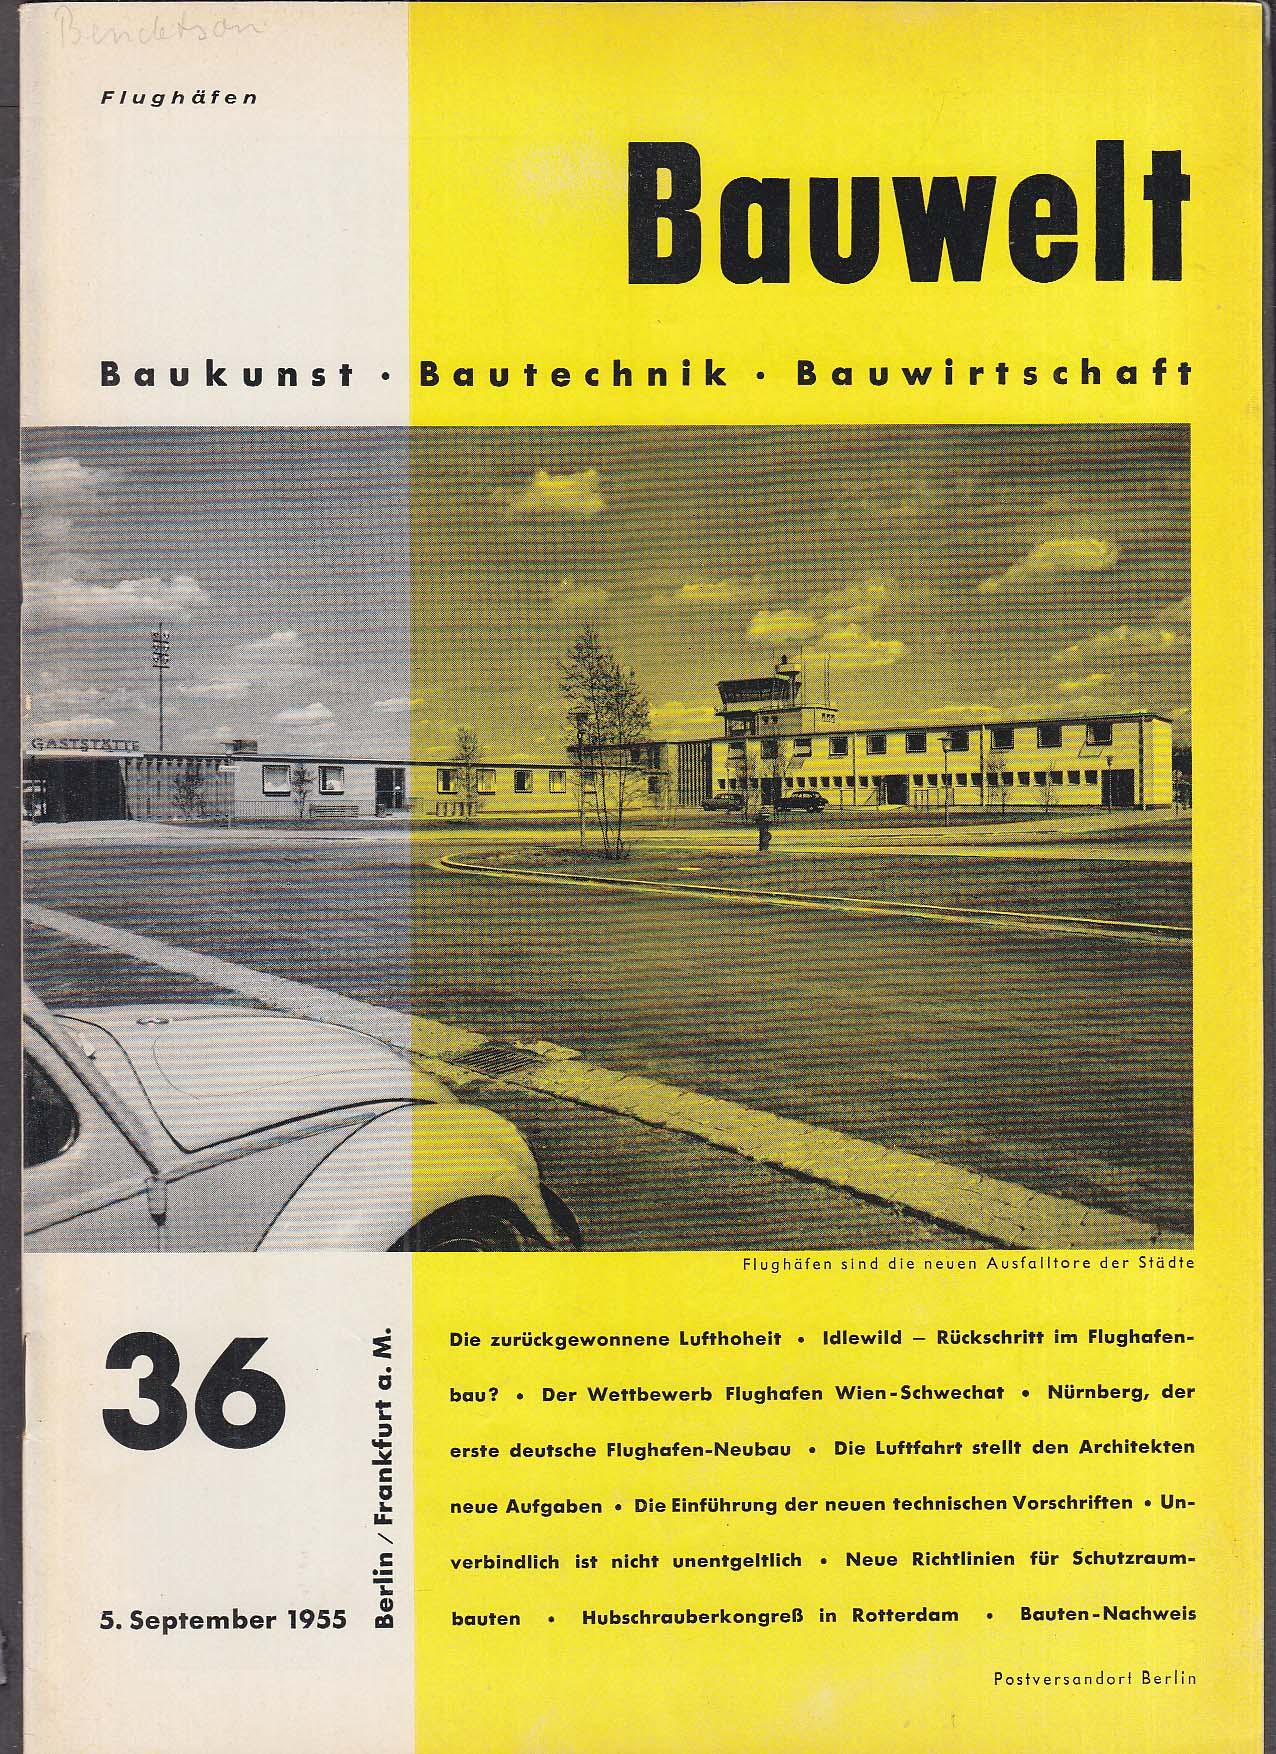 Bauwelt German architecture magazine 9/5/1955 36